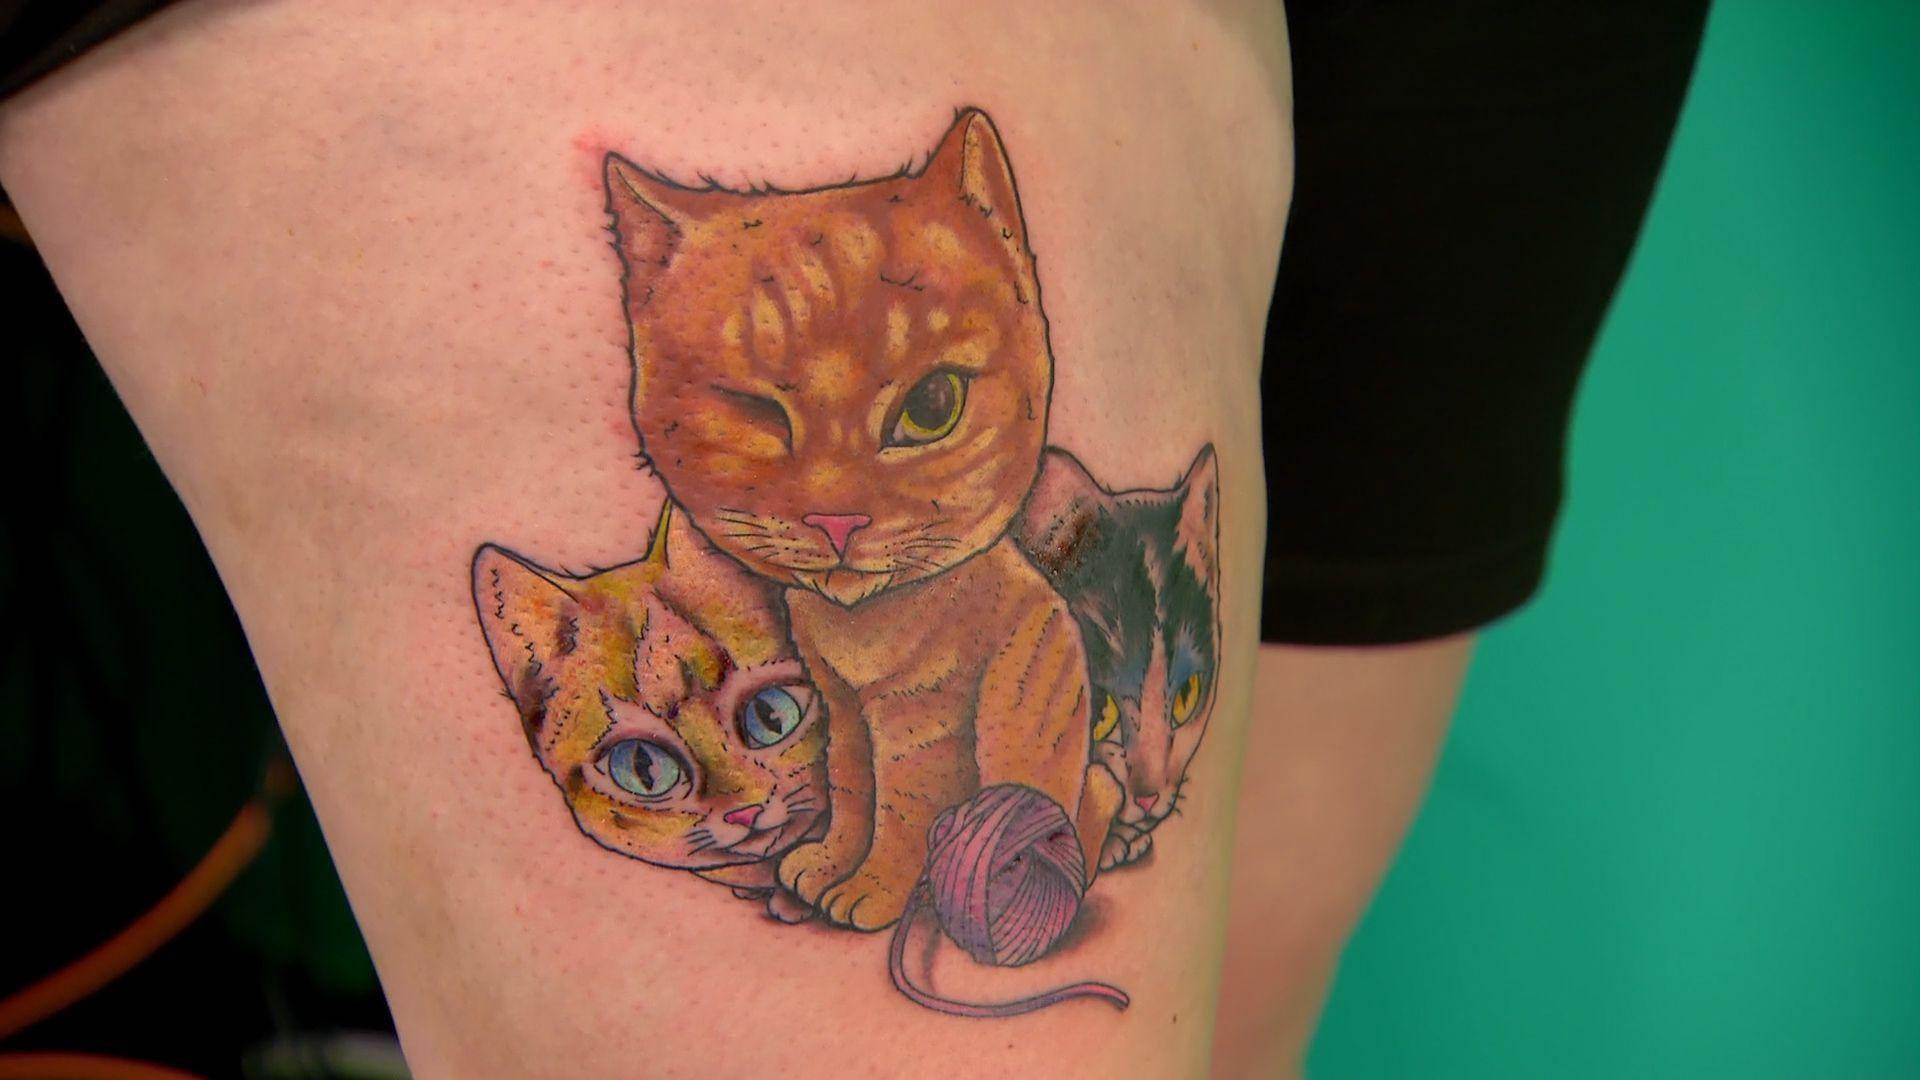 Elimination Tattoo New School Part Ii Ink Master Spike